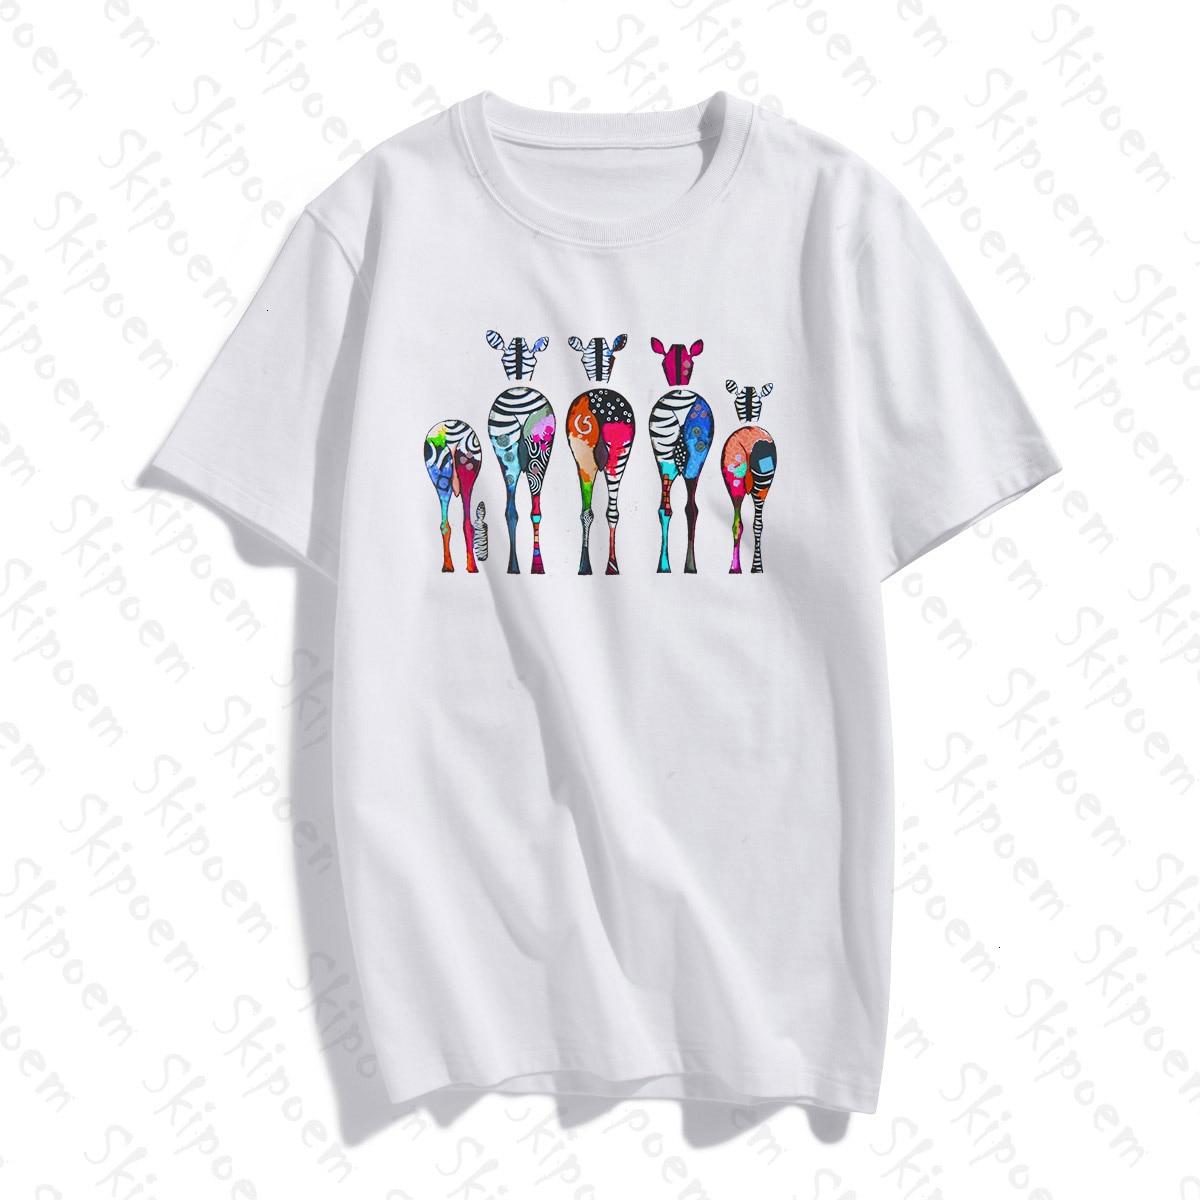 Abstract Art Colored Zebra T Shirt Women Tumblr Gothic Korean Style Harajuku Plus Size Cotton Short Sleeve Top Tees Streetwear